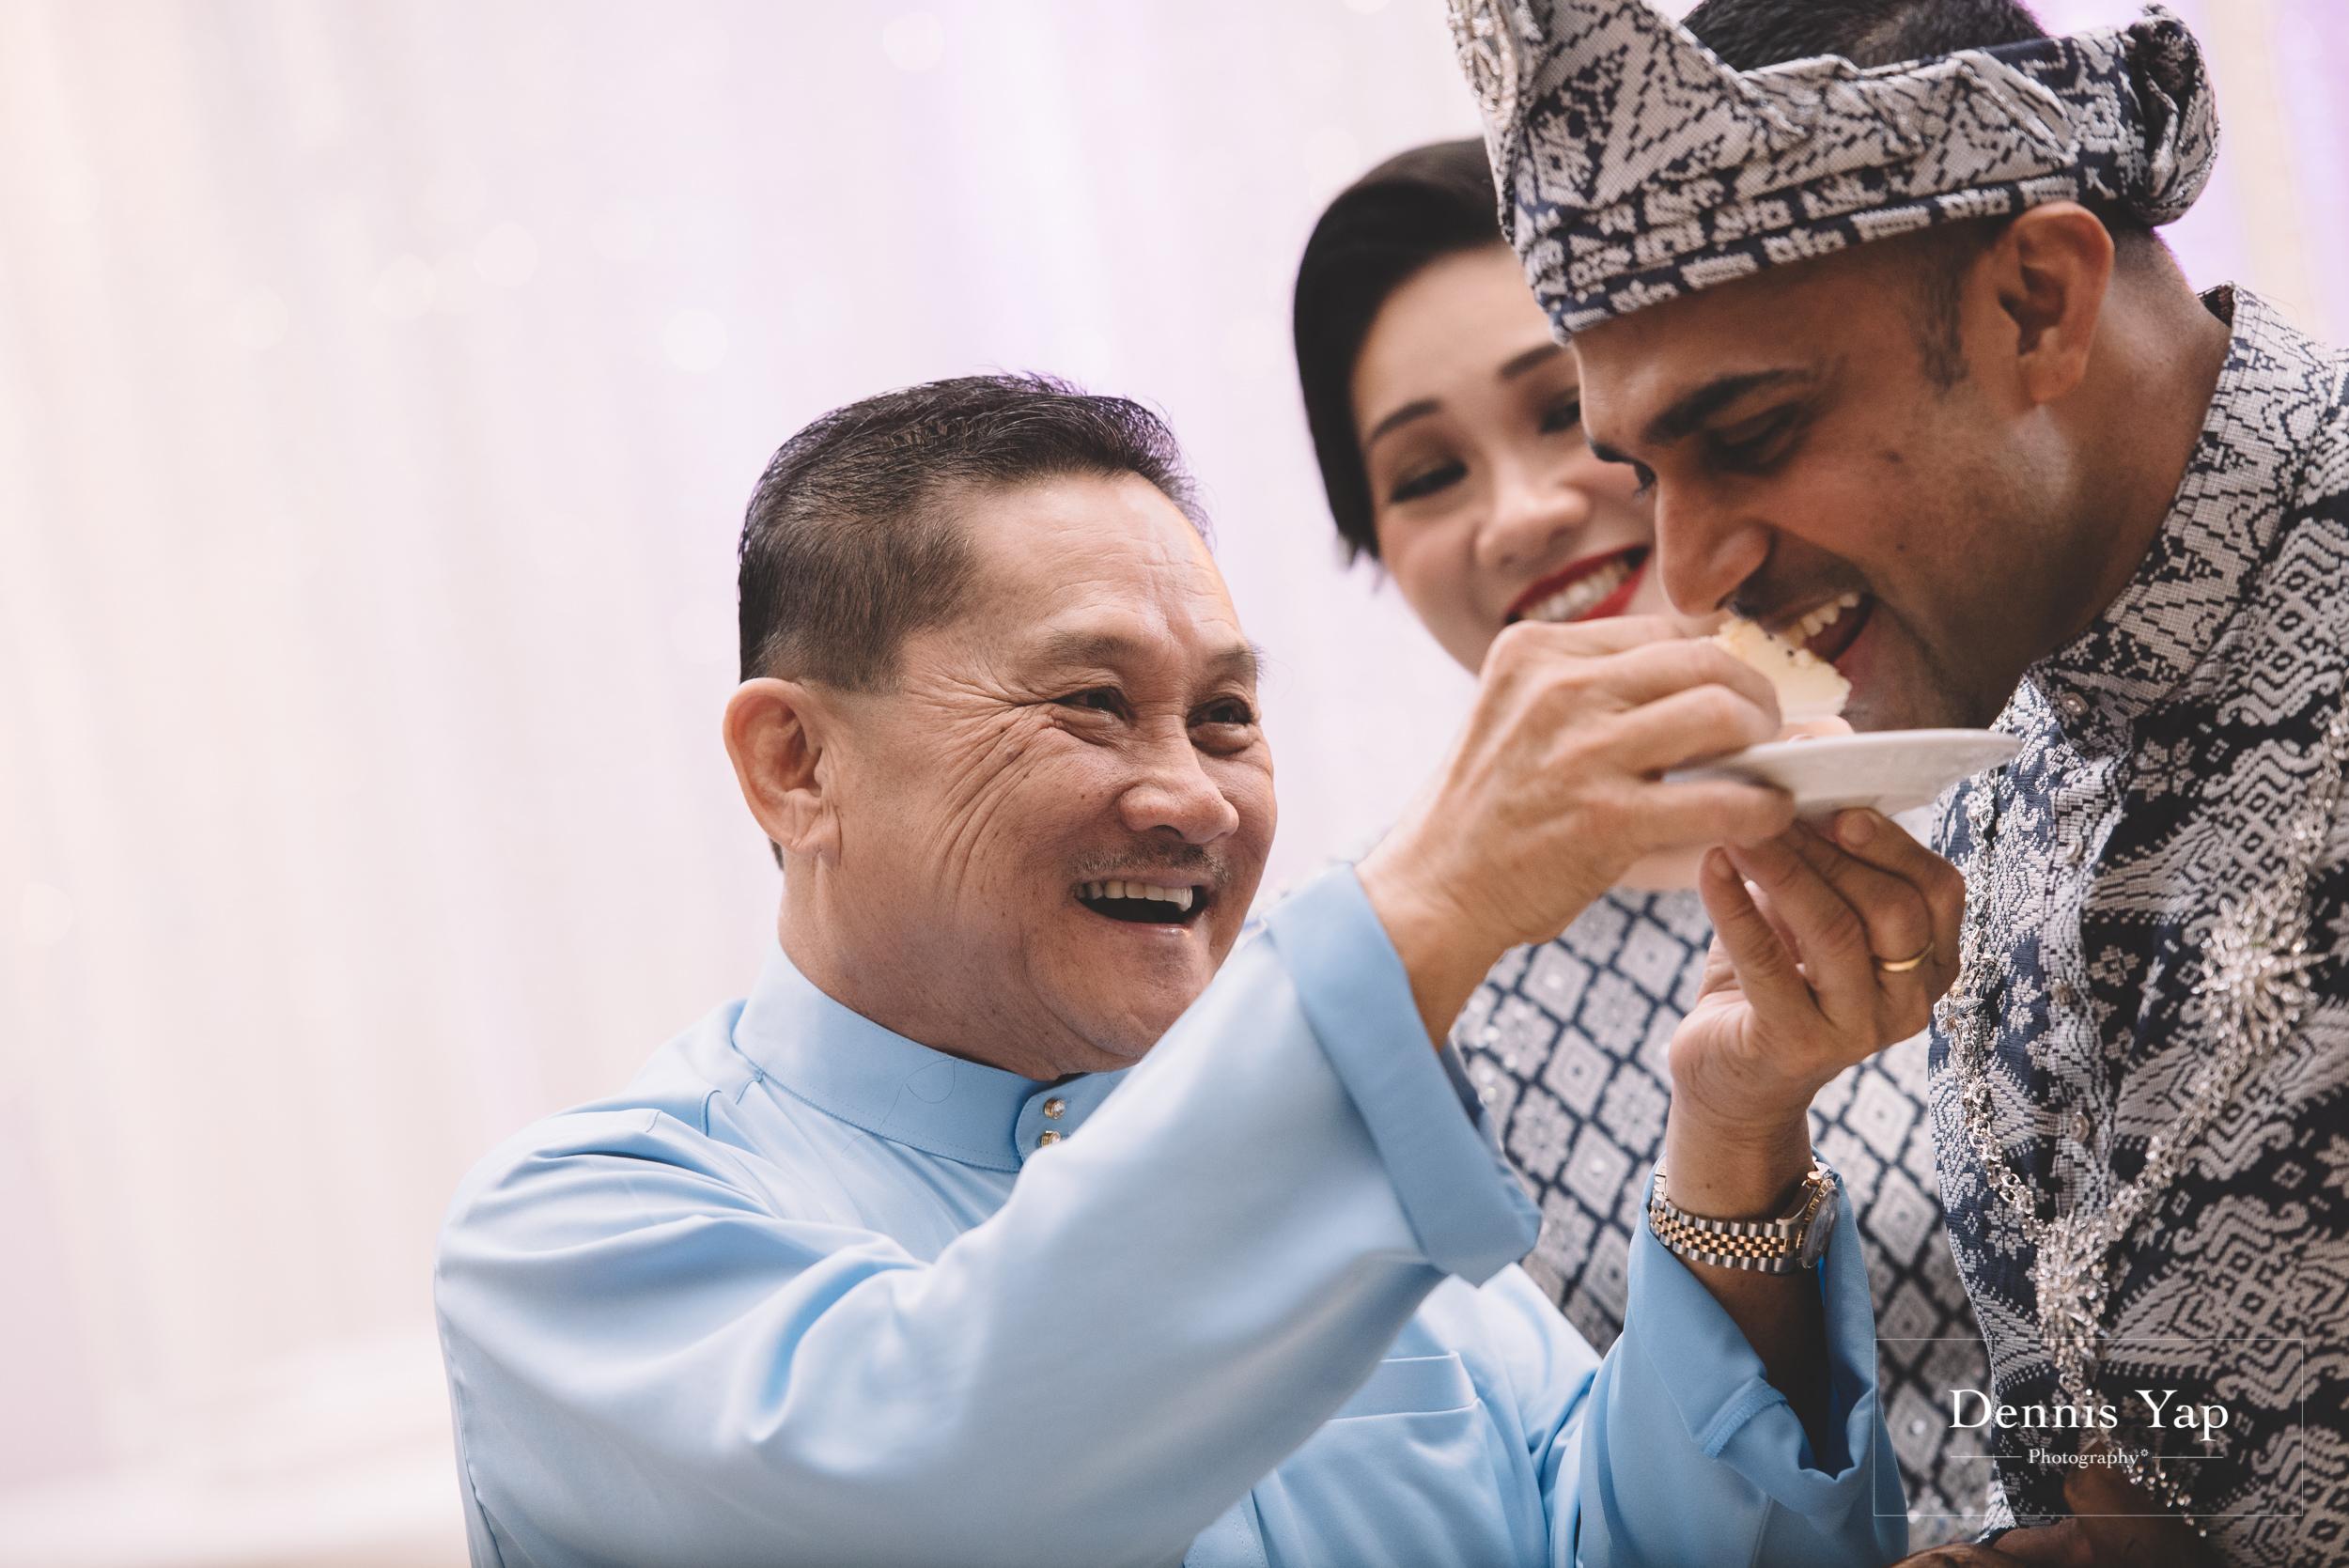 azmi zahraa malay wedding ceremony dennis yap photography malaysia wedding photographer-14.jpg